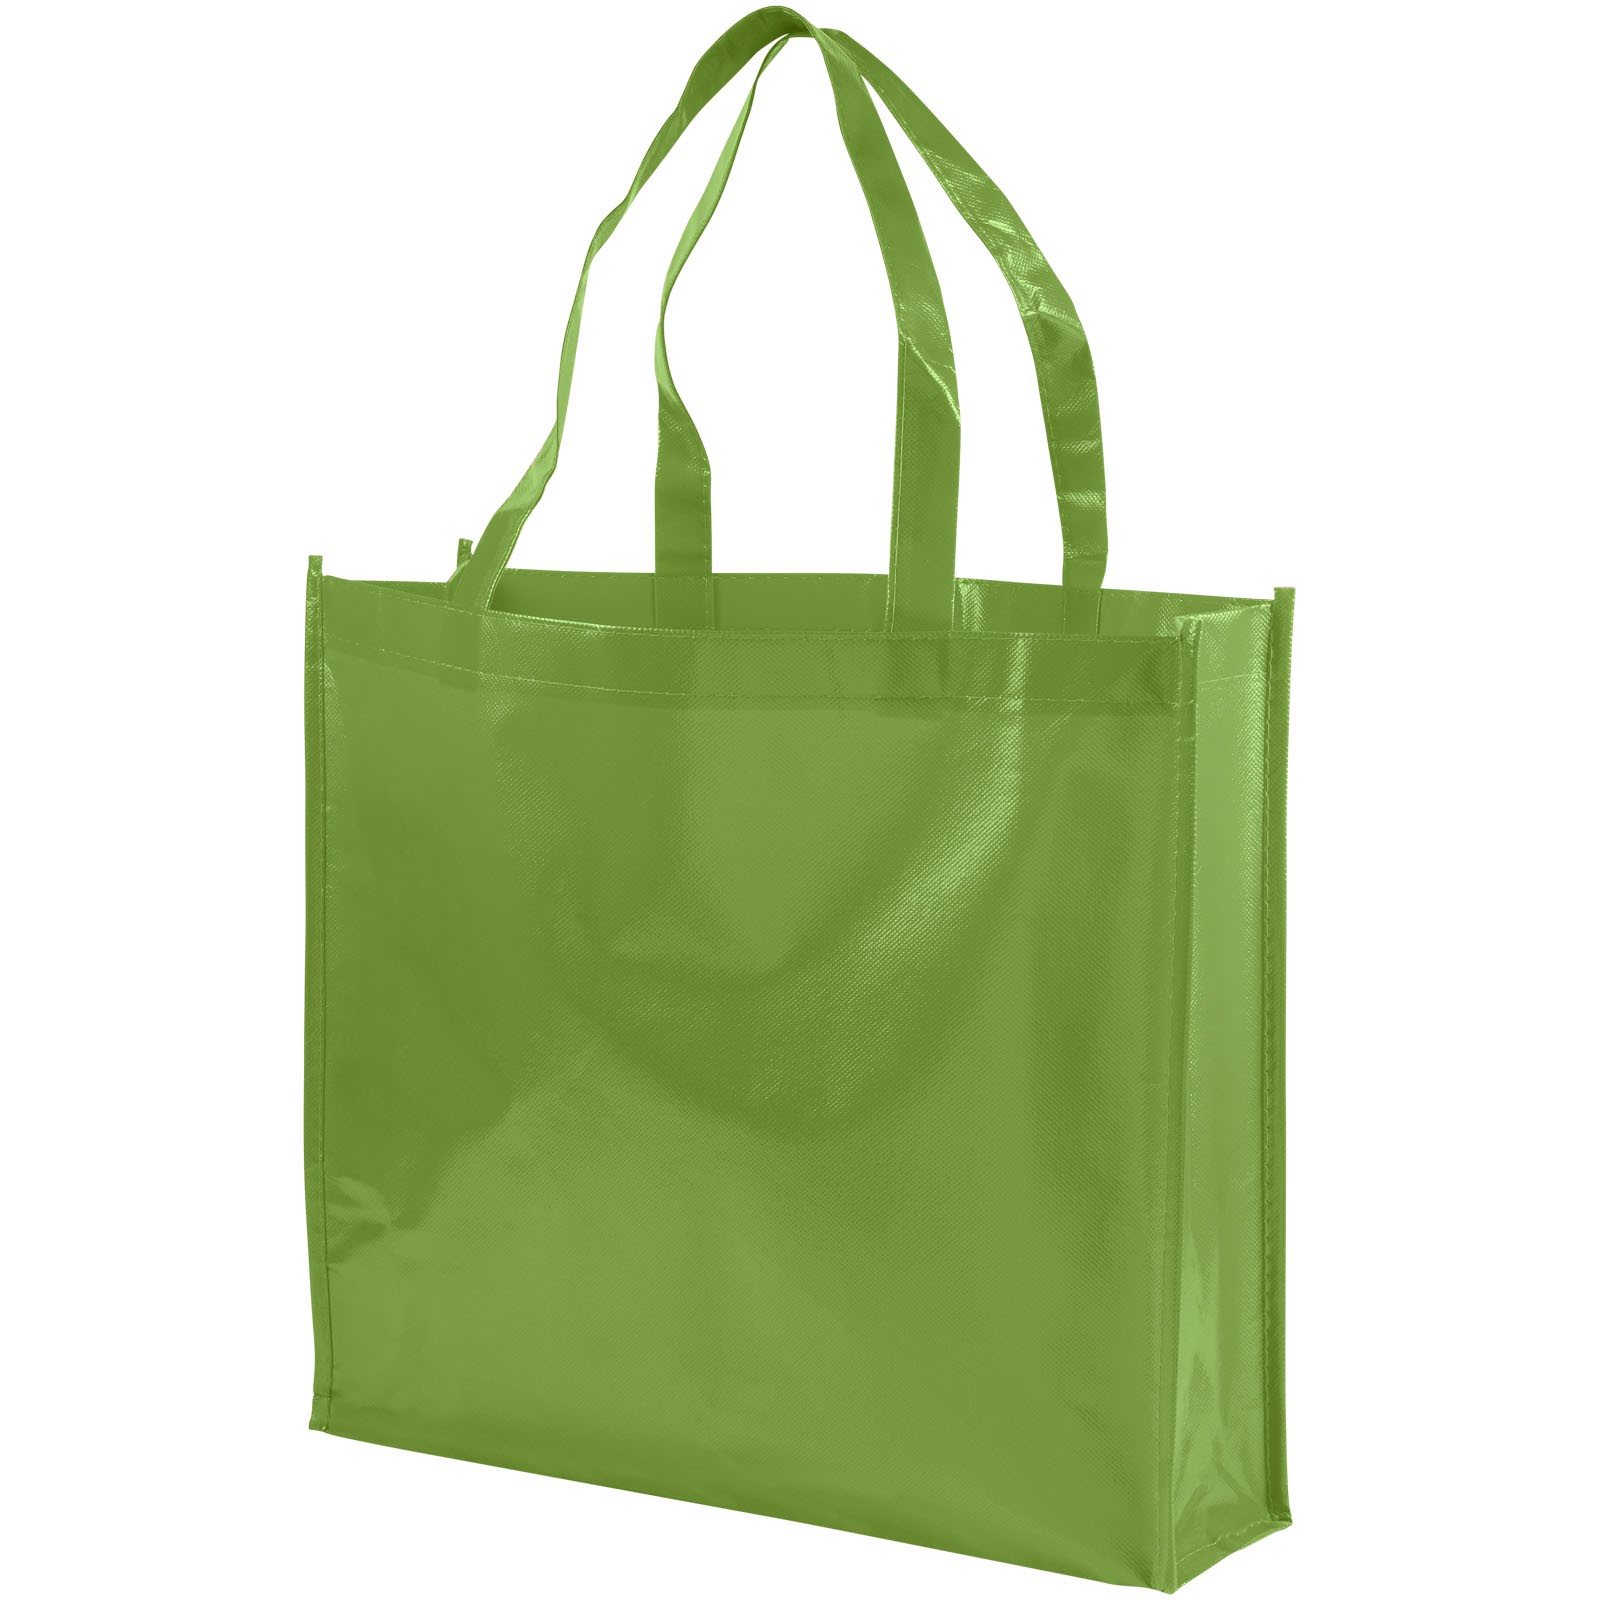 Shiny laminated non-woven shopping tote bag - Lime